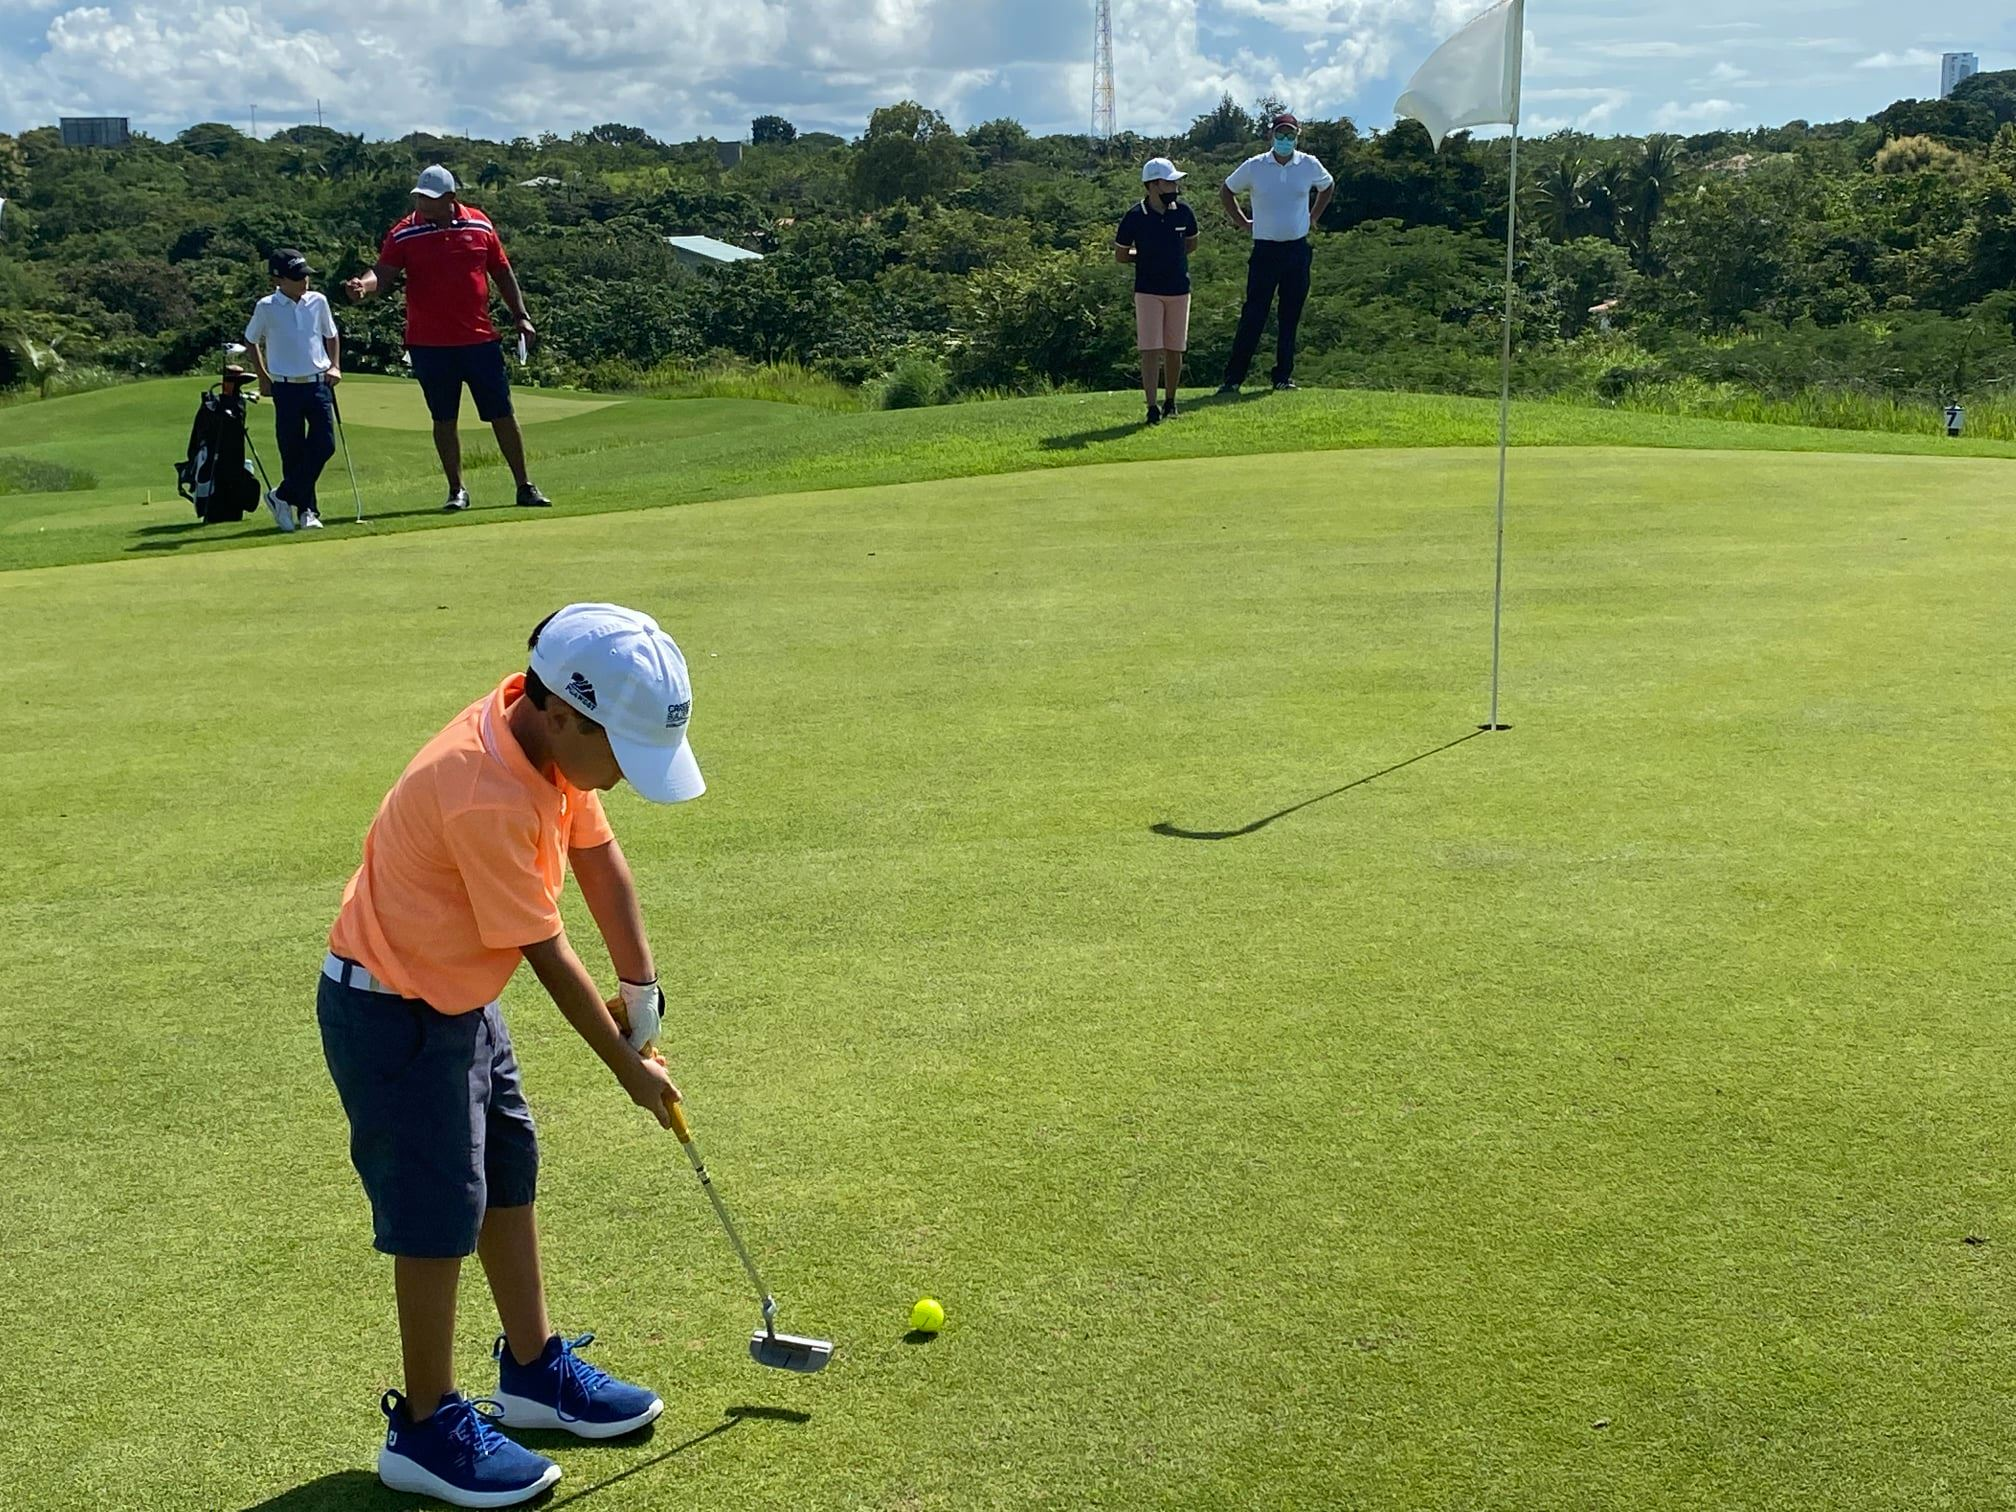 Semillero de Golf Kiwanis entra en recta final